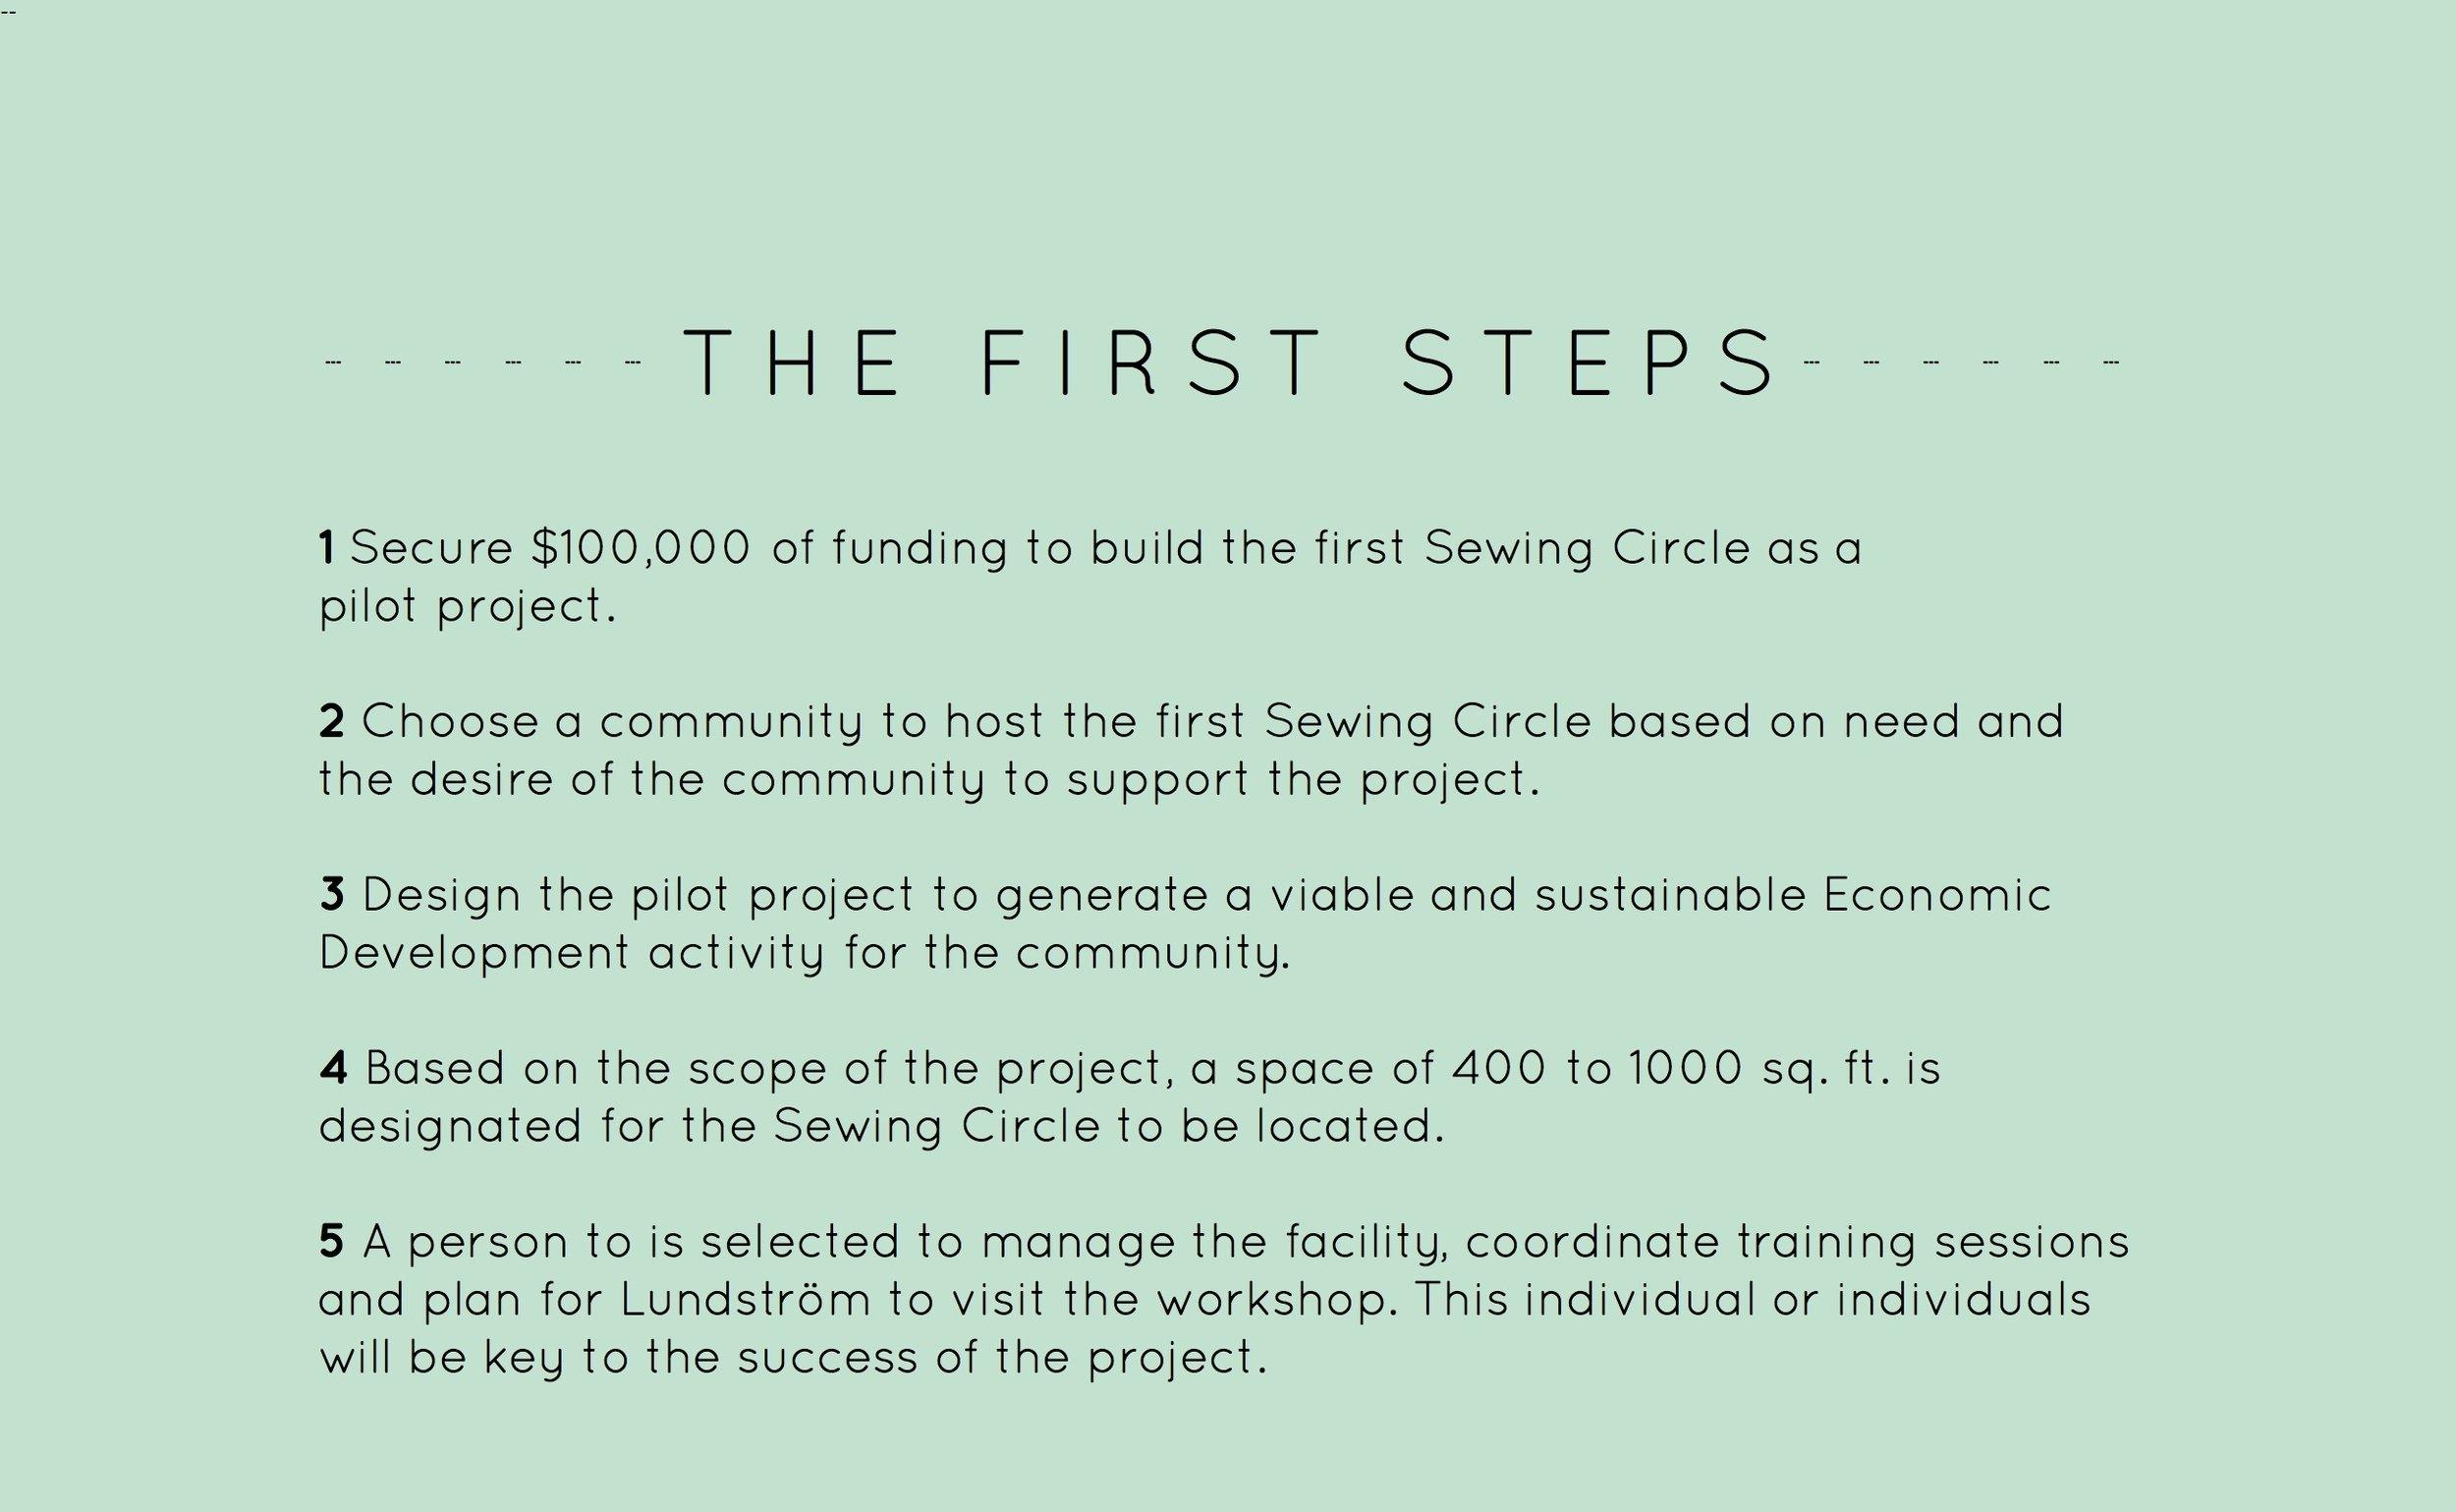 SewingCircle-Presentation5-7.jpg